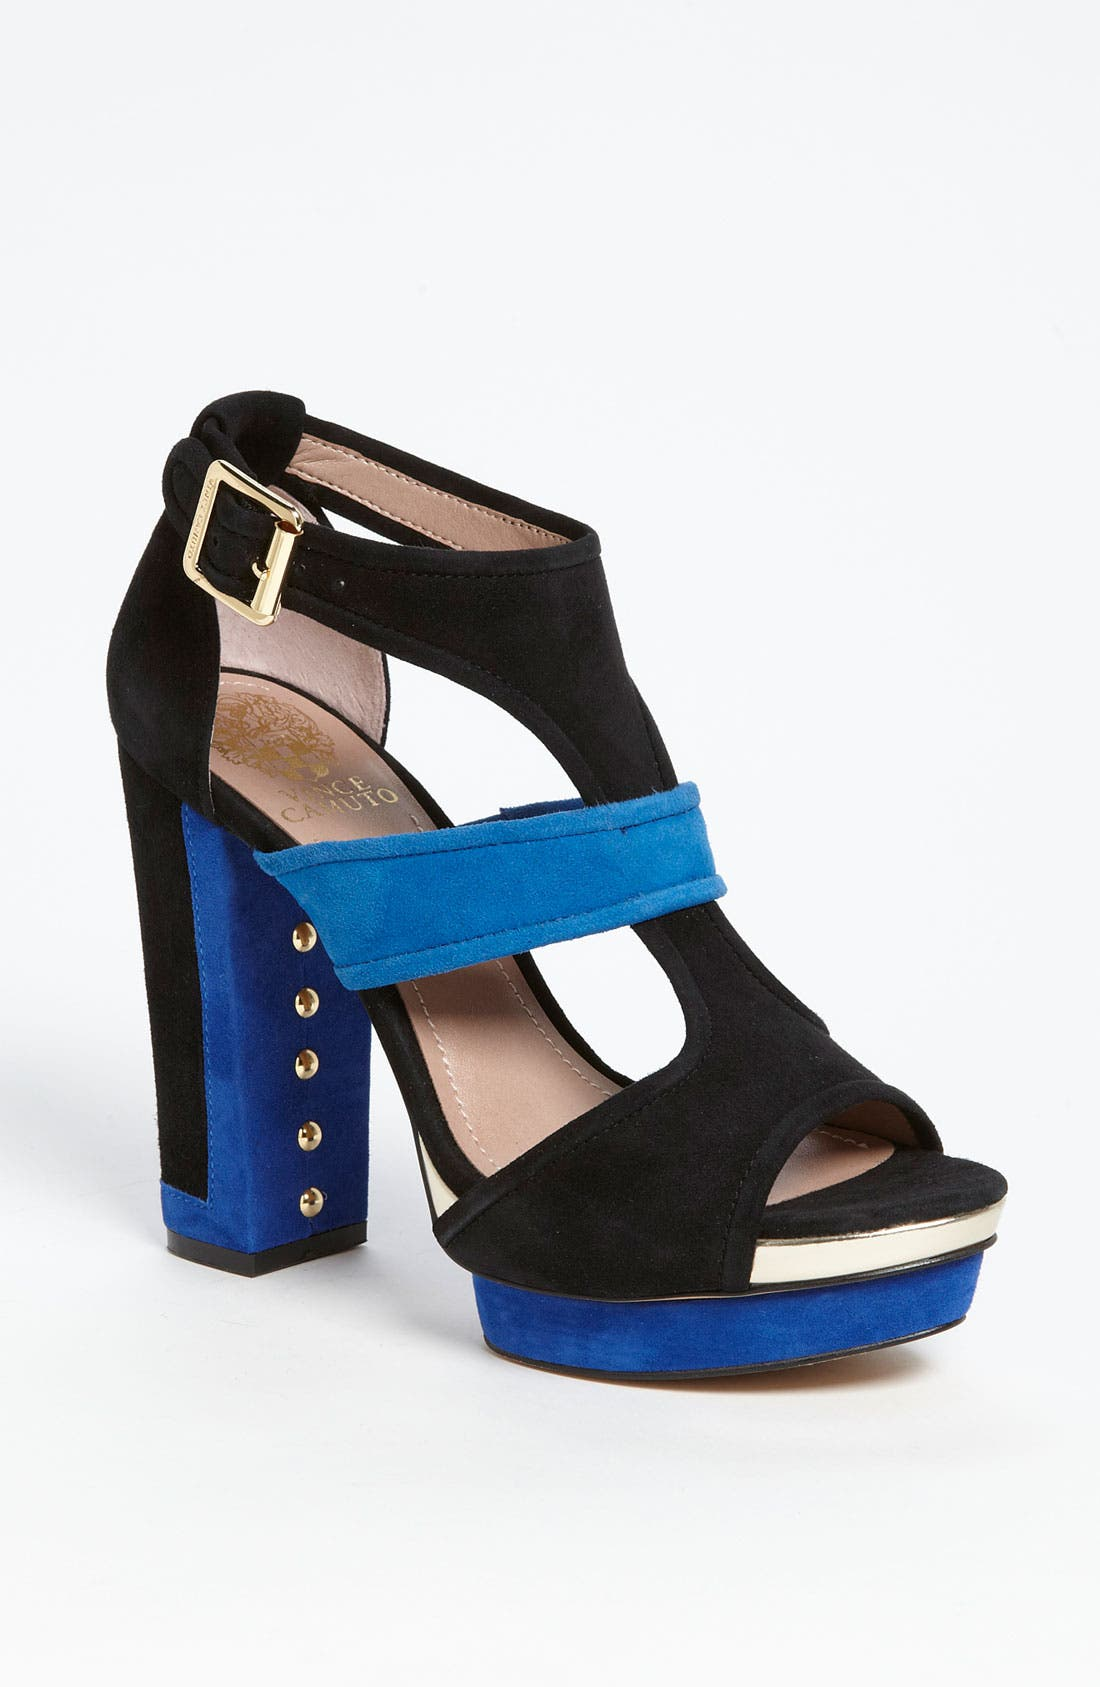 Alternate Image 1 Selected - Vince Camuto 'Padon' Sandal